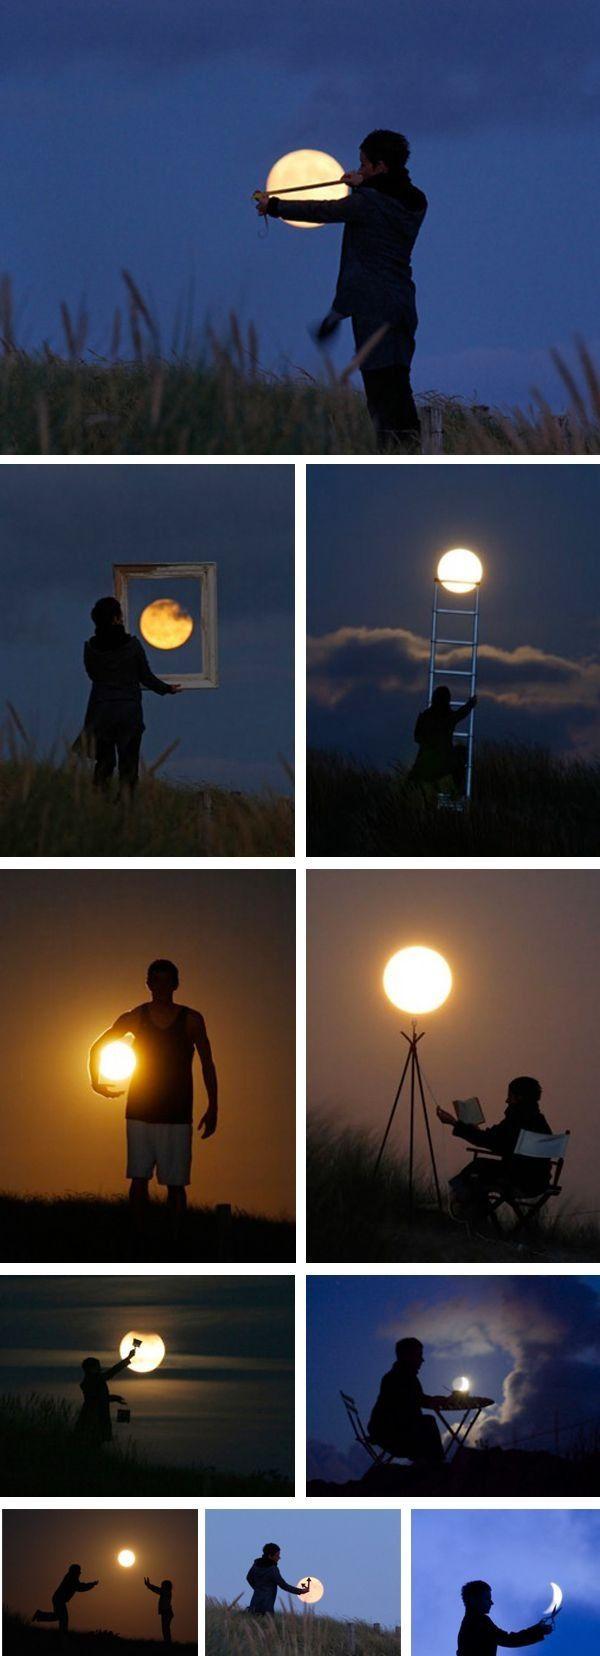 #creative #photos #moon #Mond #bilder